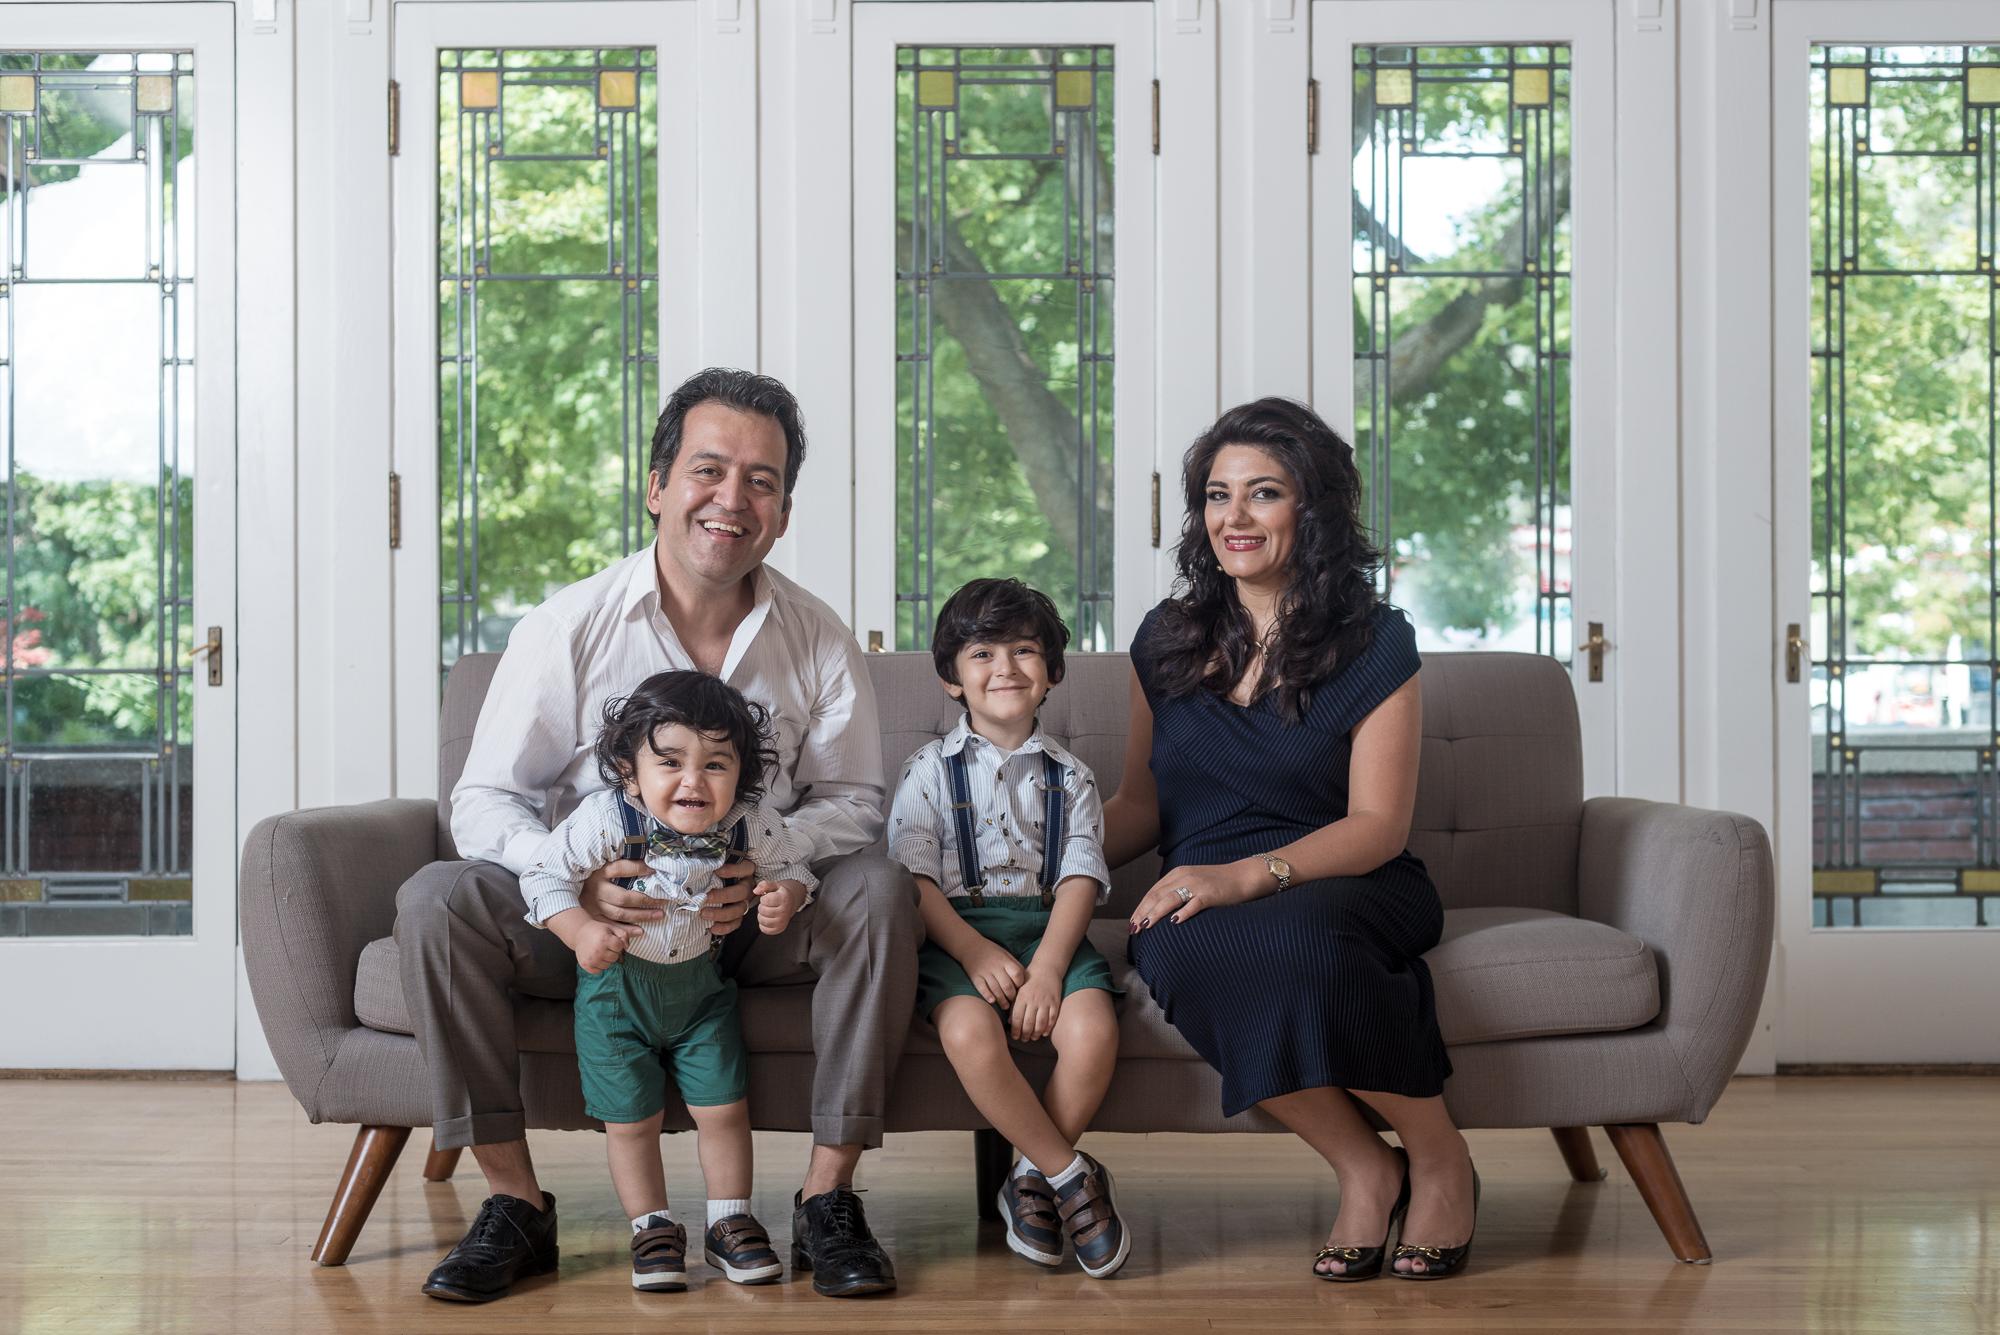 FamilyPortraits_PhotoCollectiveStudios.com-1655.jpg